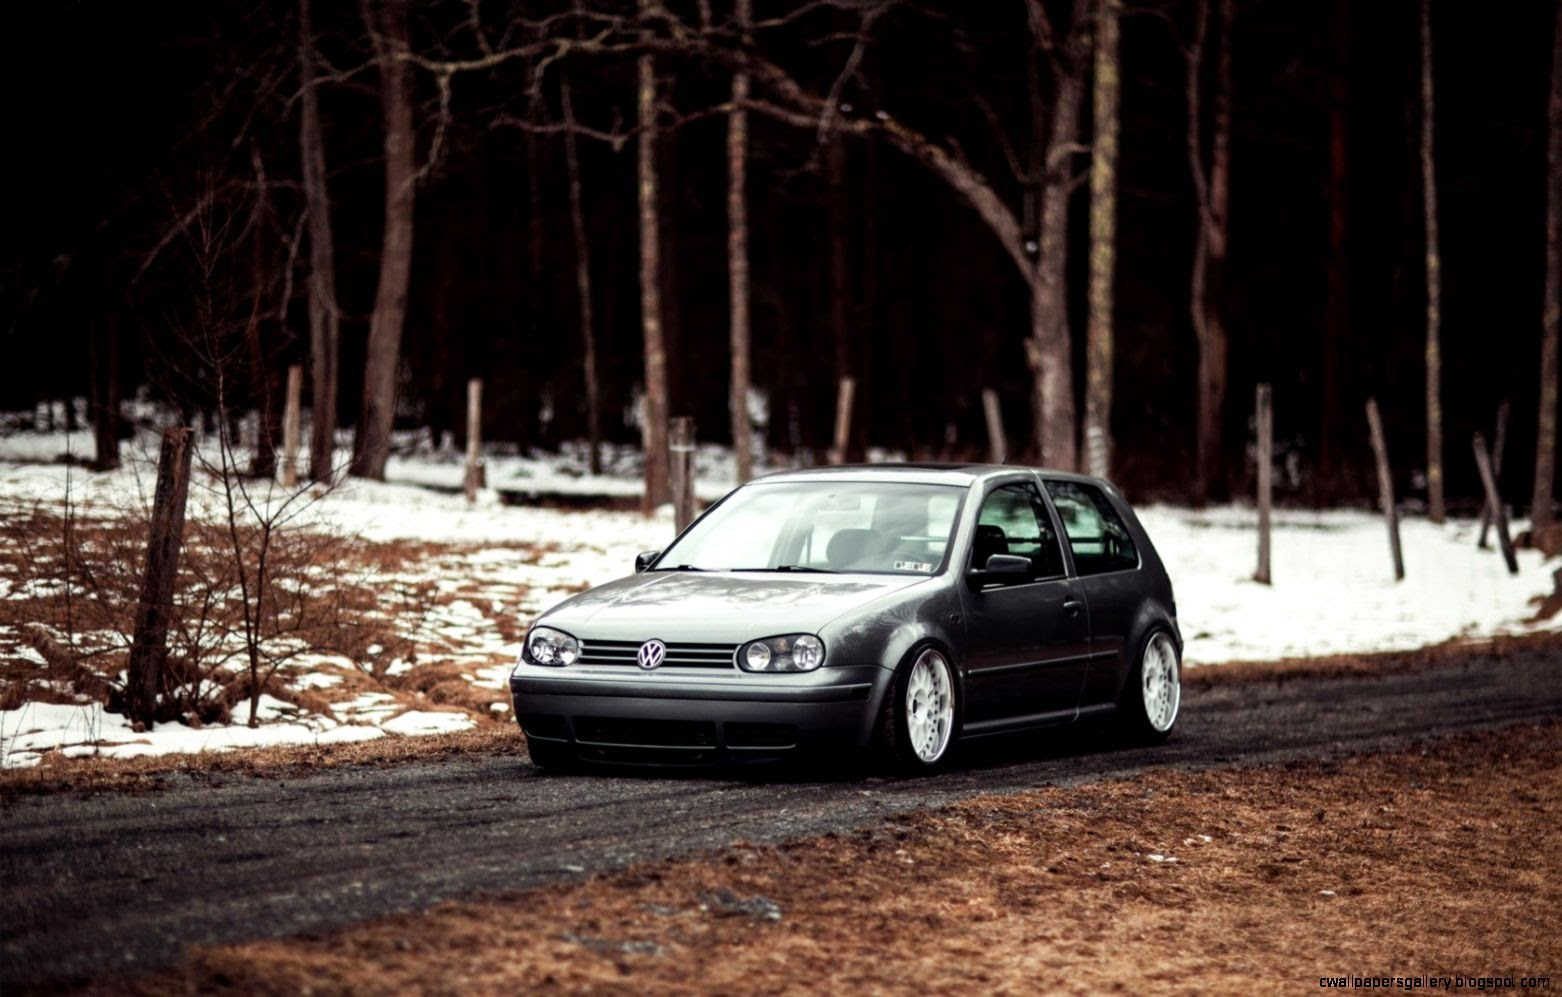 Volkswagen Golf MK4 Car 6994929